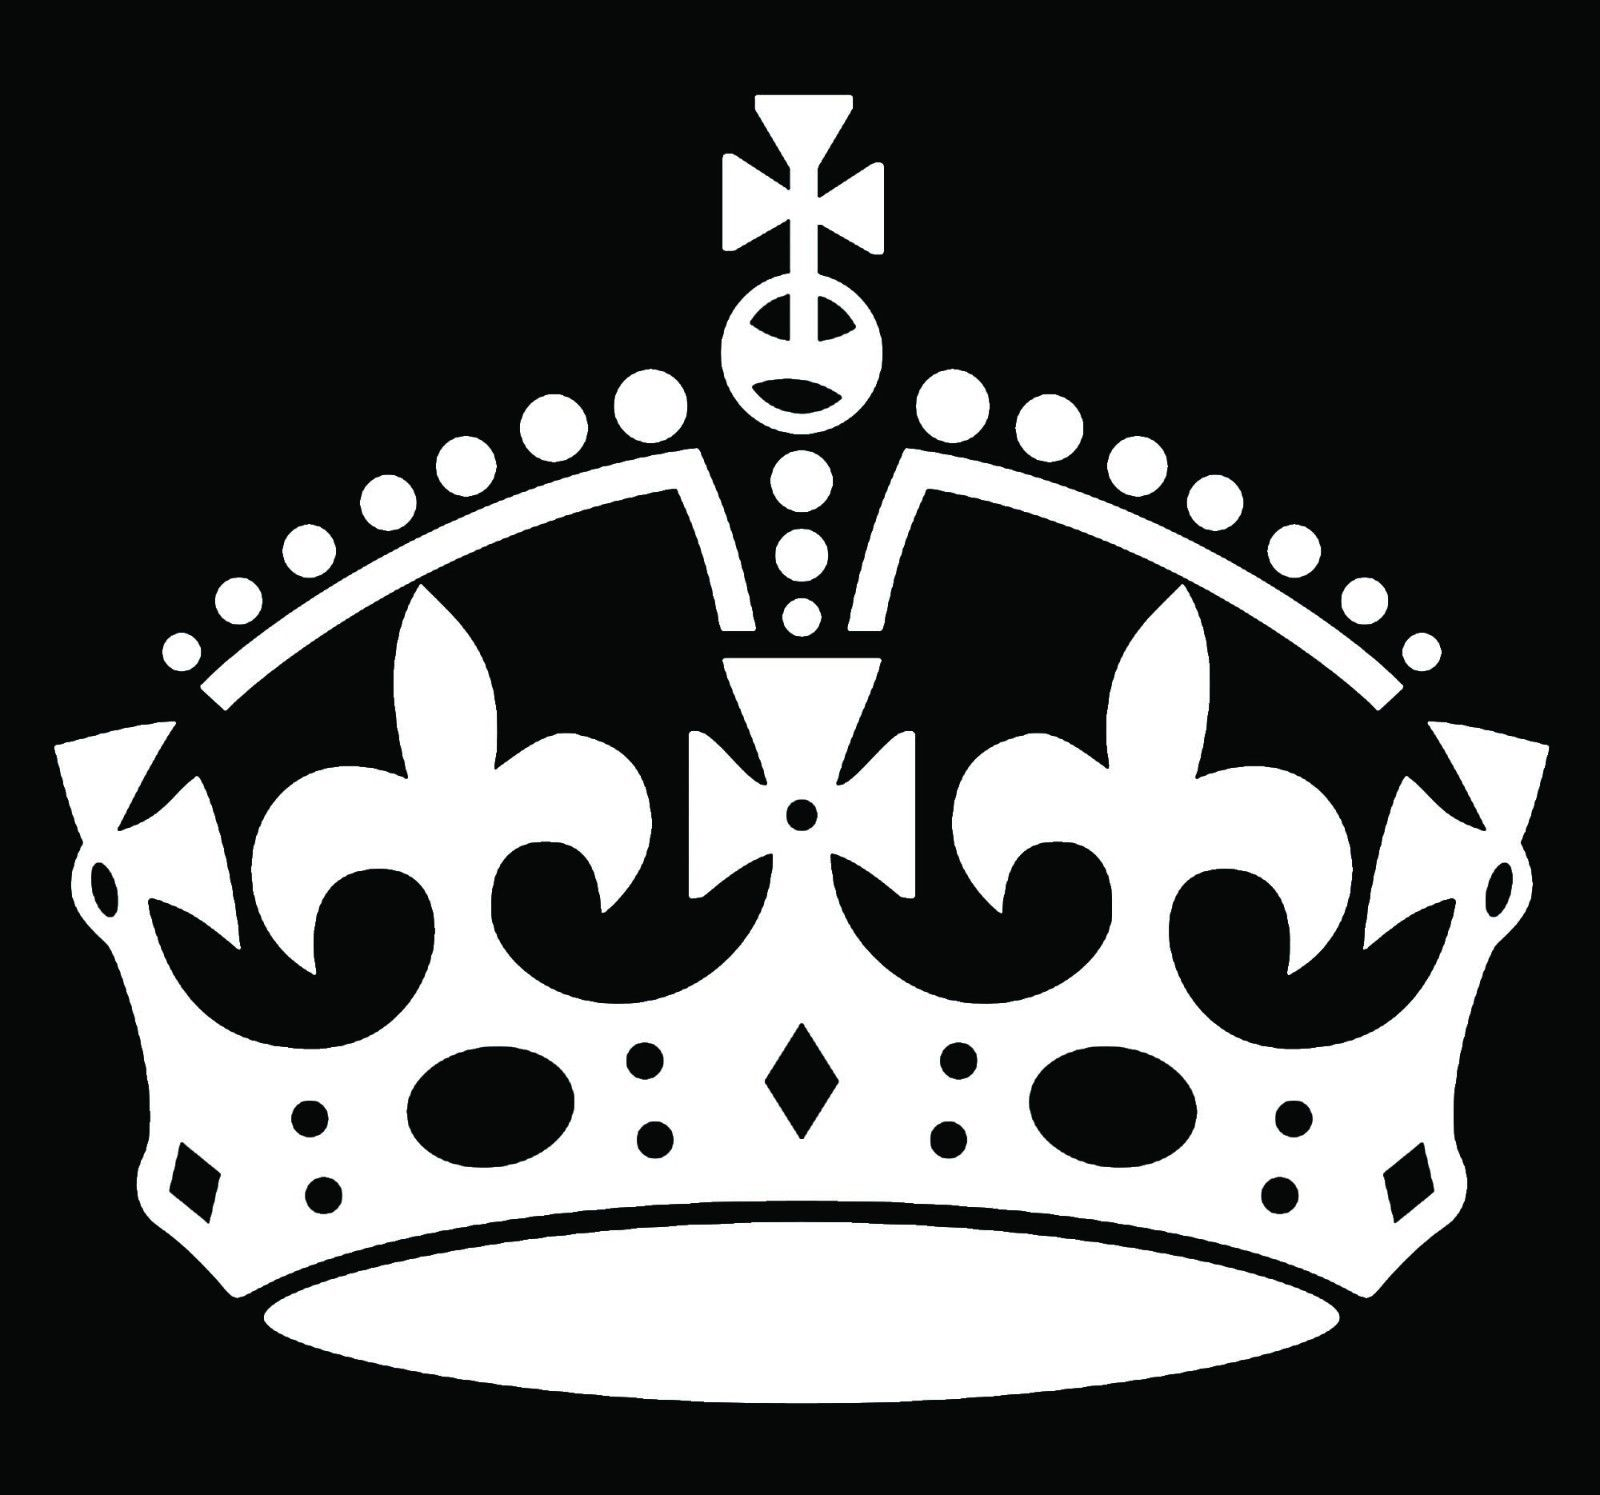 Free Keep Calm Crown, Download Free Clip Art, Free Clip Art.